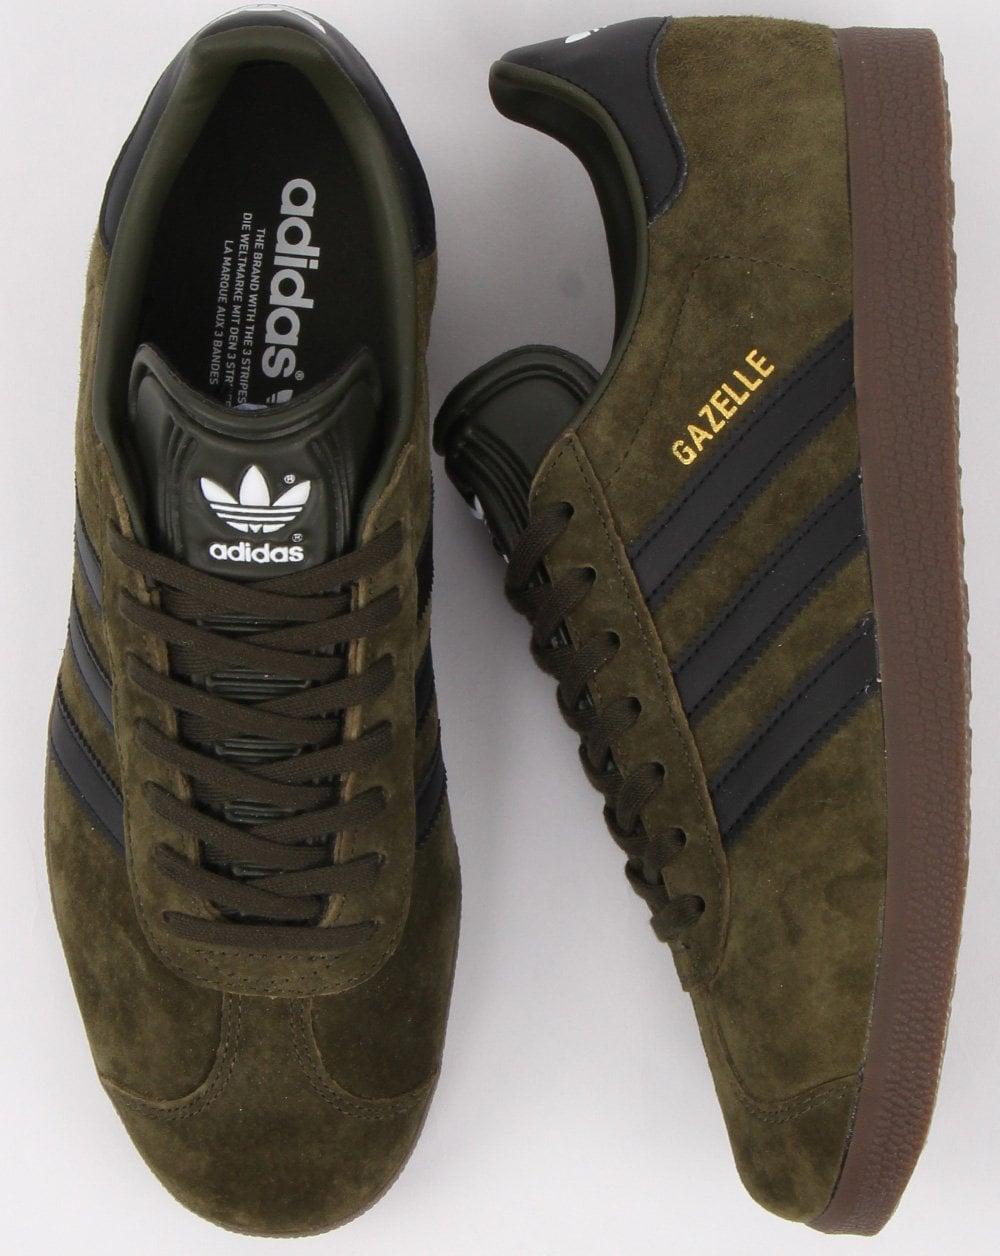 Adidas Gazelle Trainers Night Olive/Black/Gum